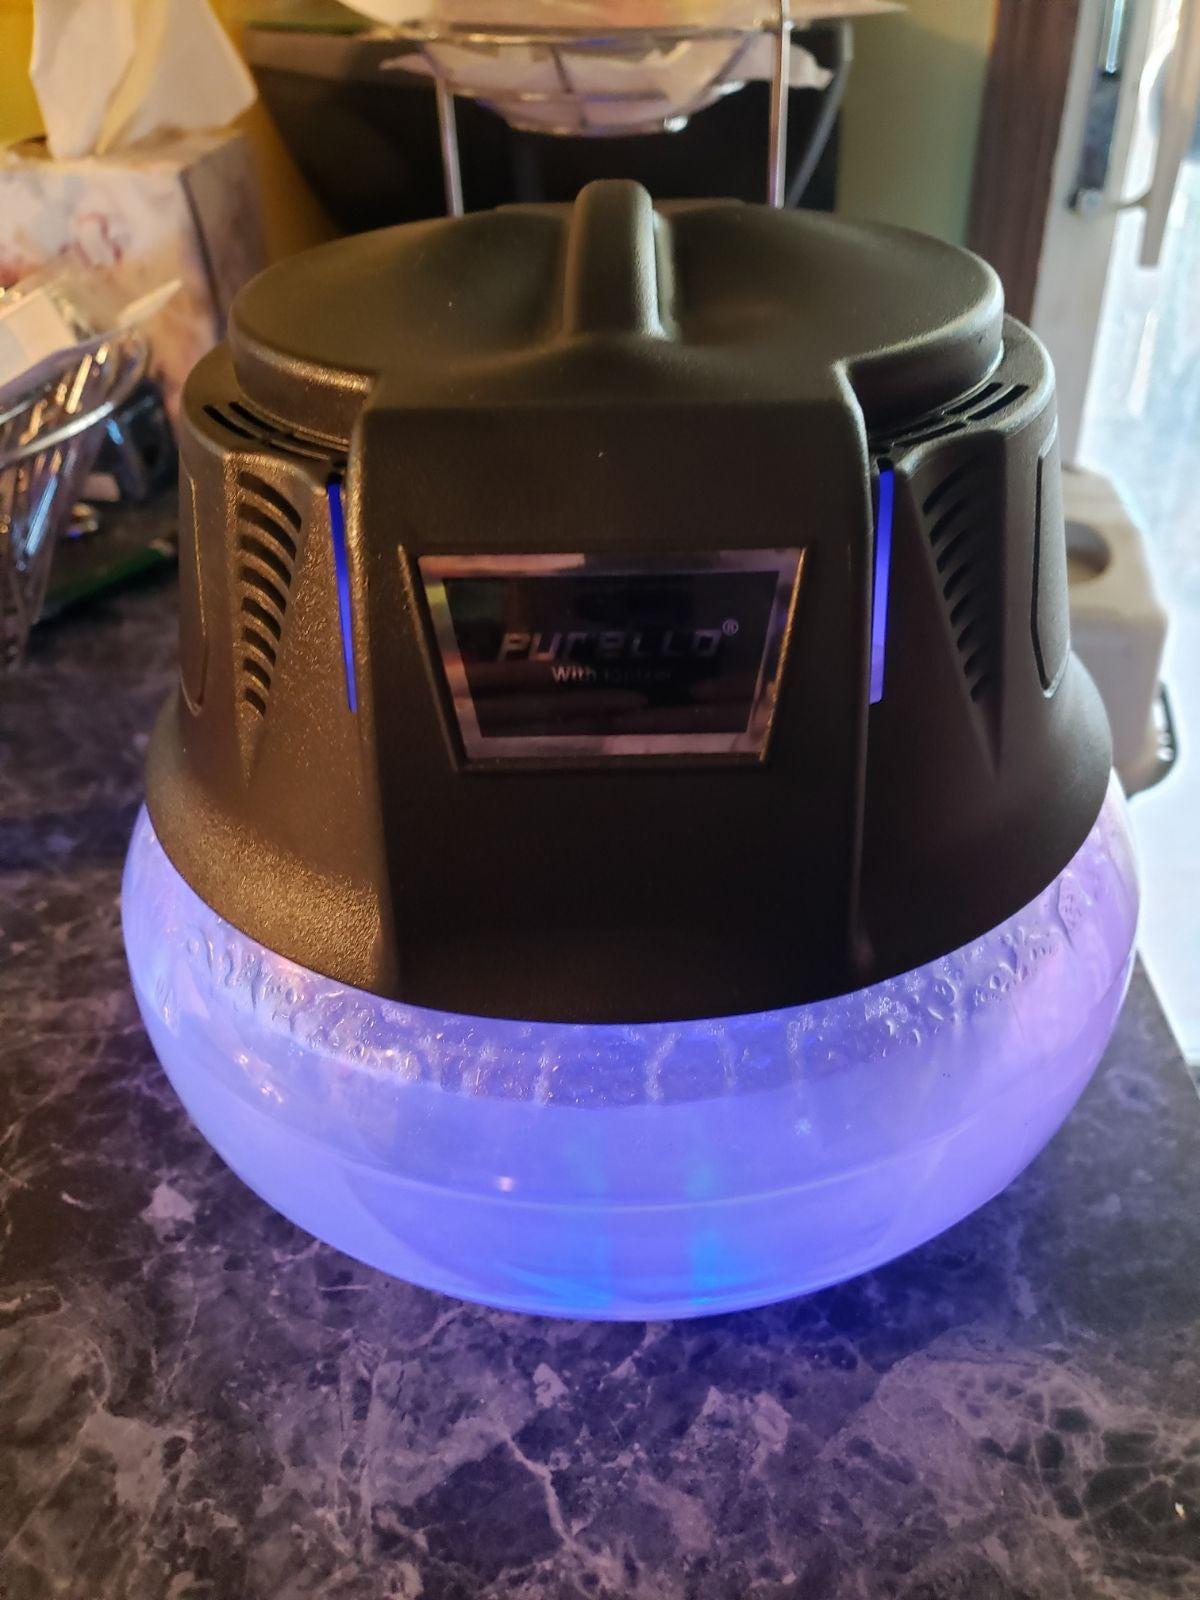 Air freshener/purifier with ionizer